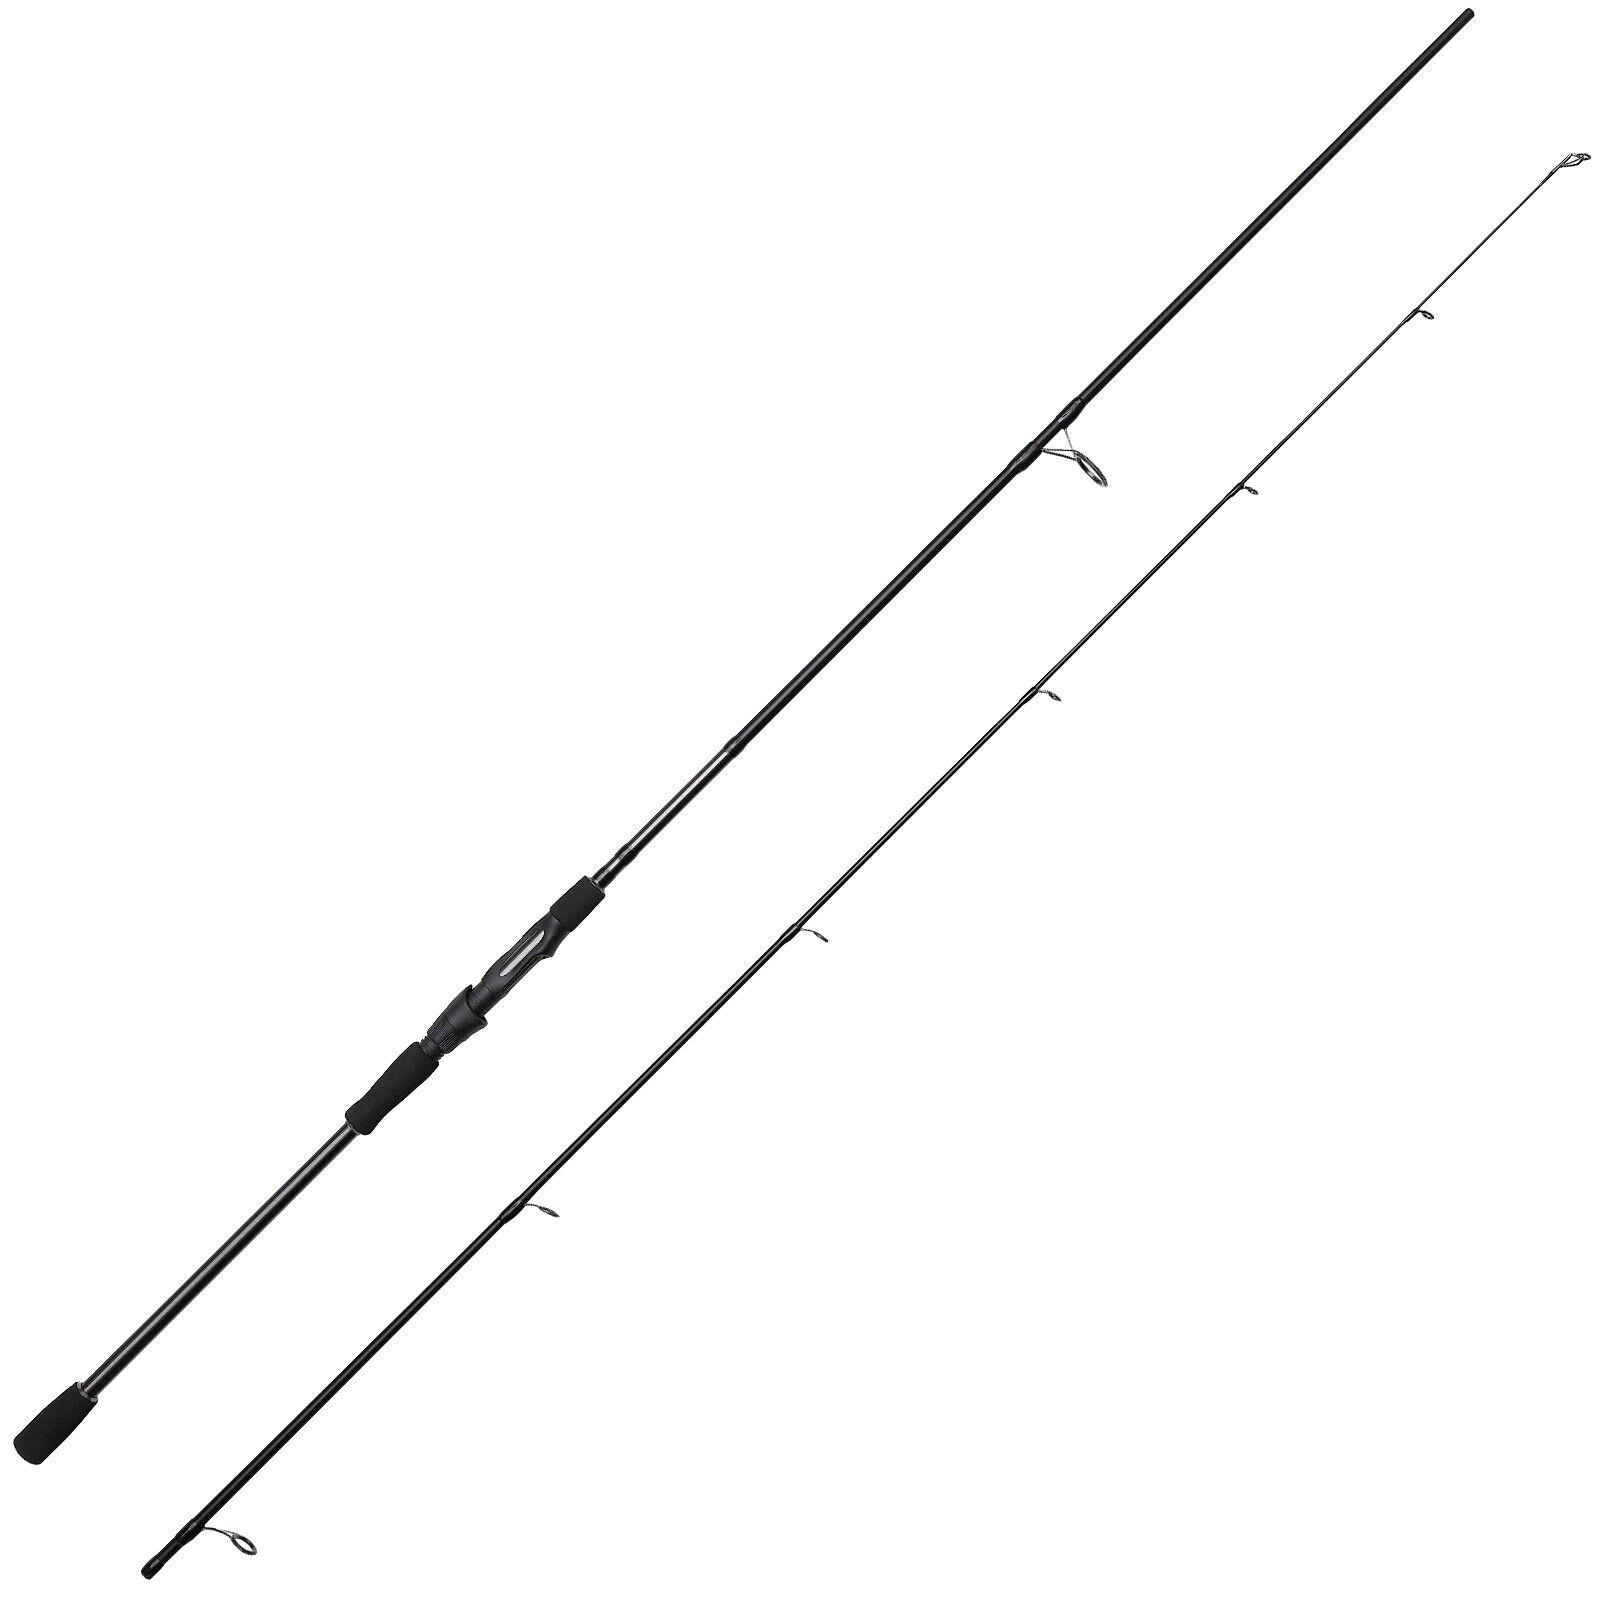 Okuma Fishing Pole-Altera Spin 9ft0in 2,70m - 20-80g - 2 pieces